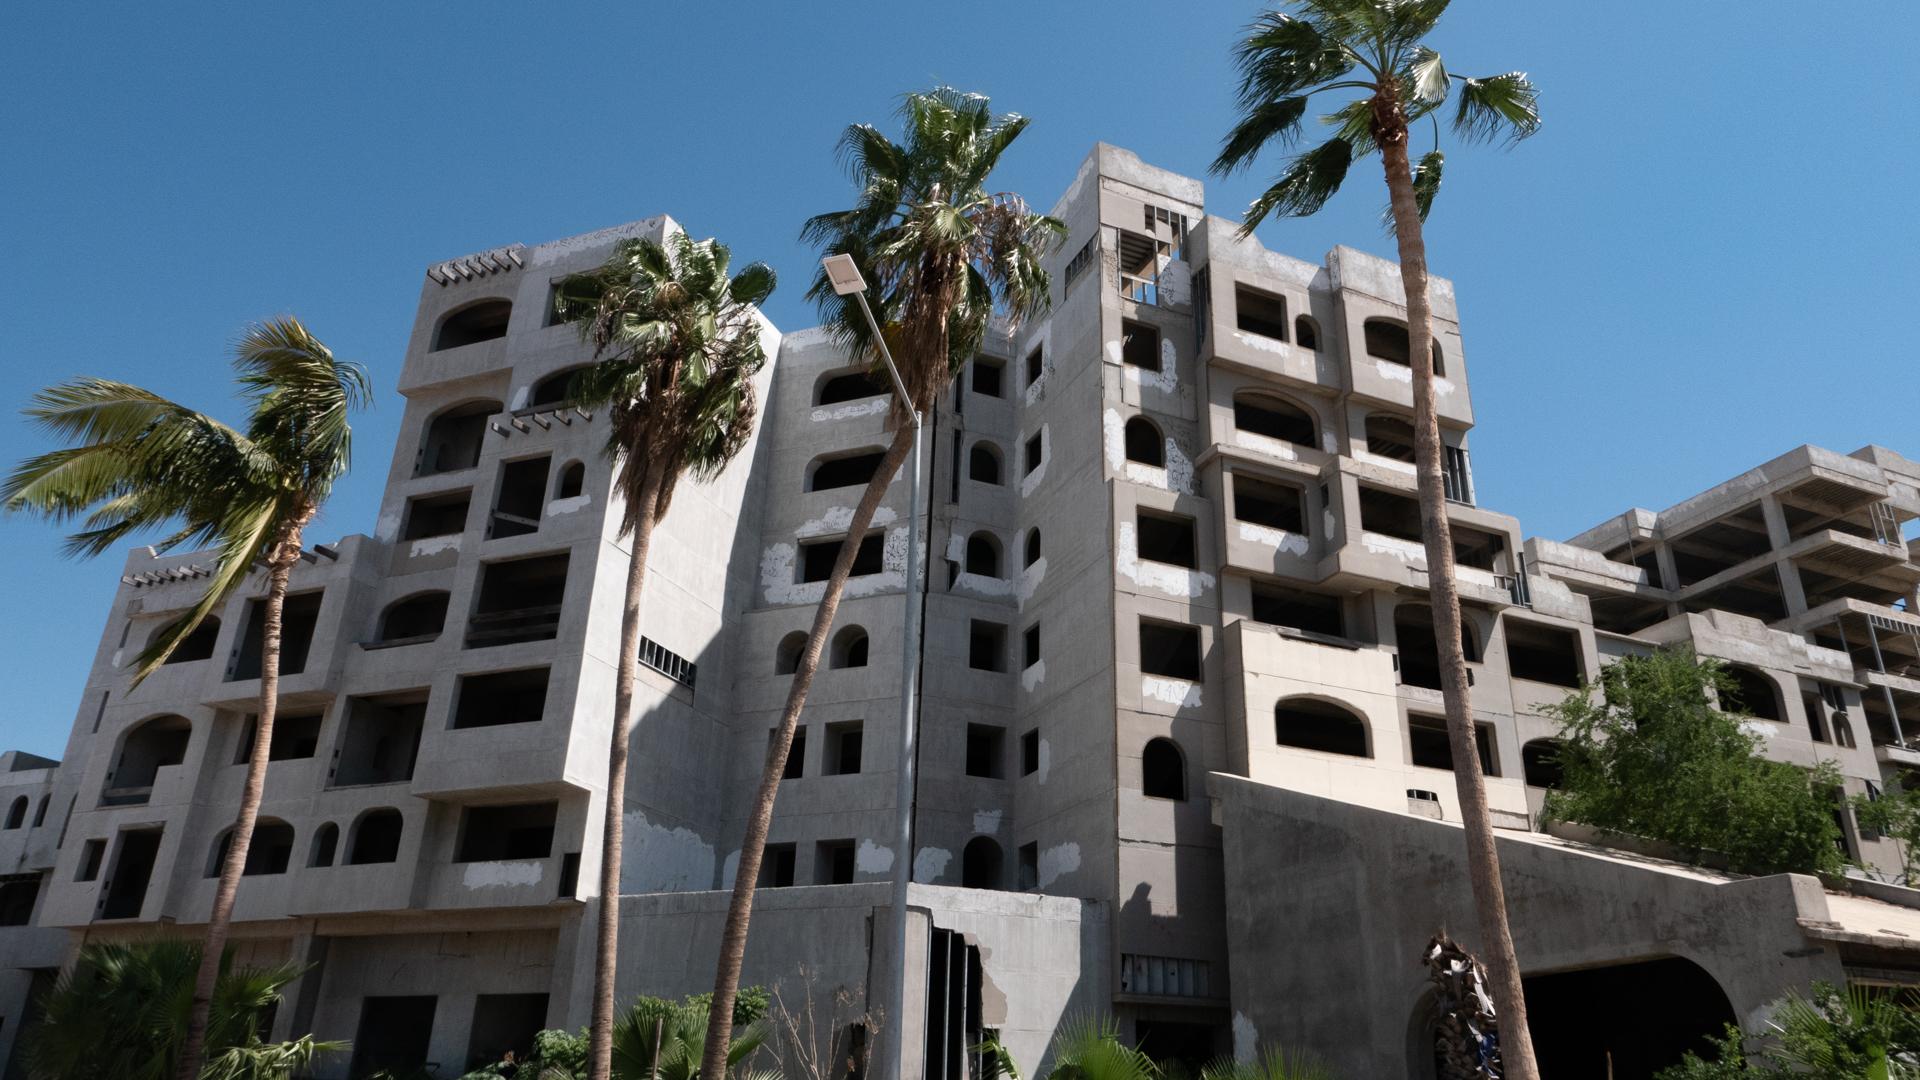 cabo-san-lucas-concrete-apartment.jpg